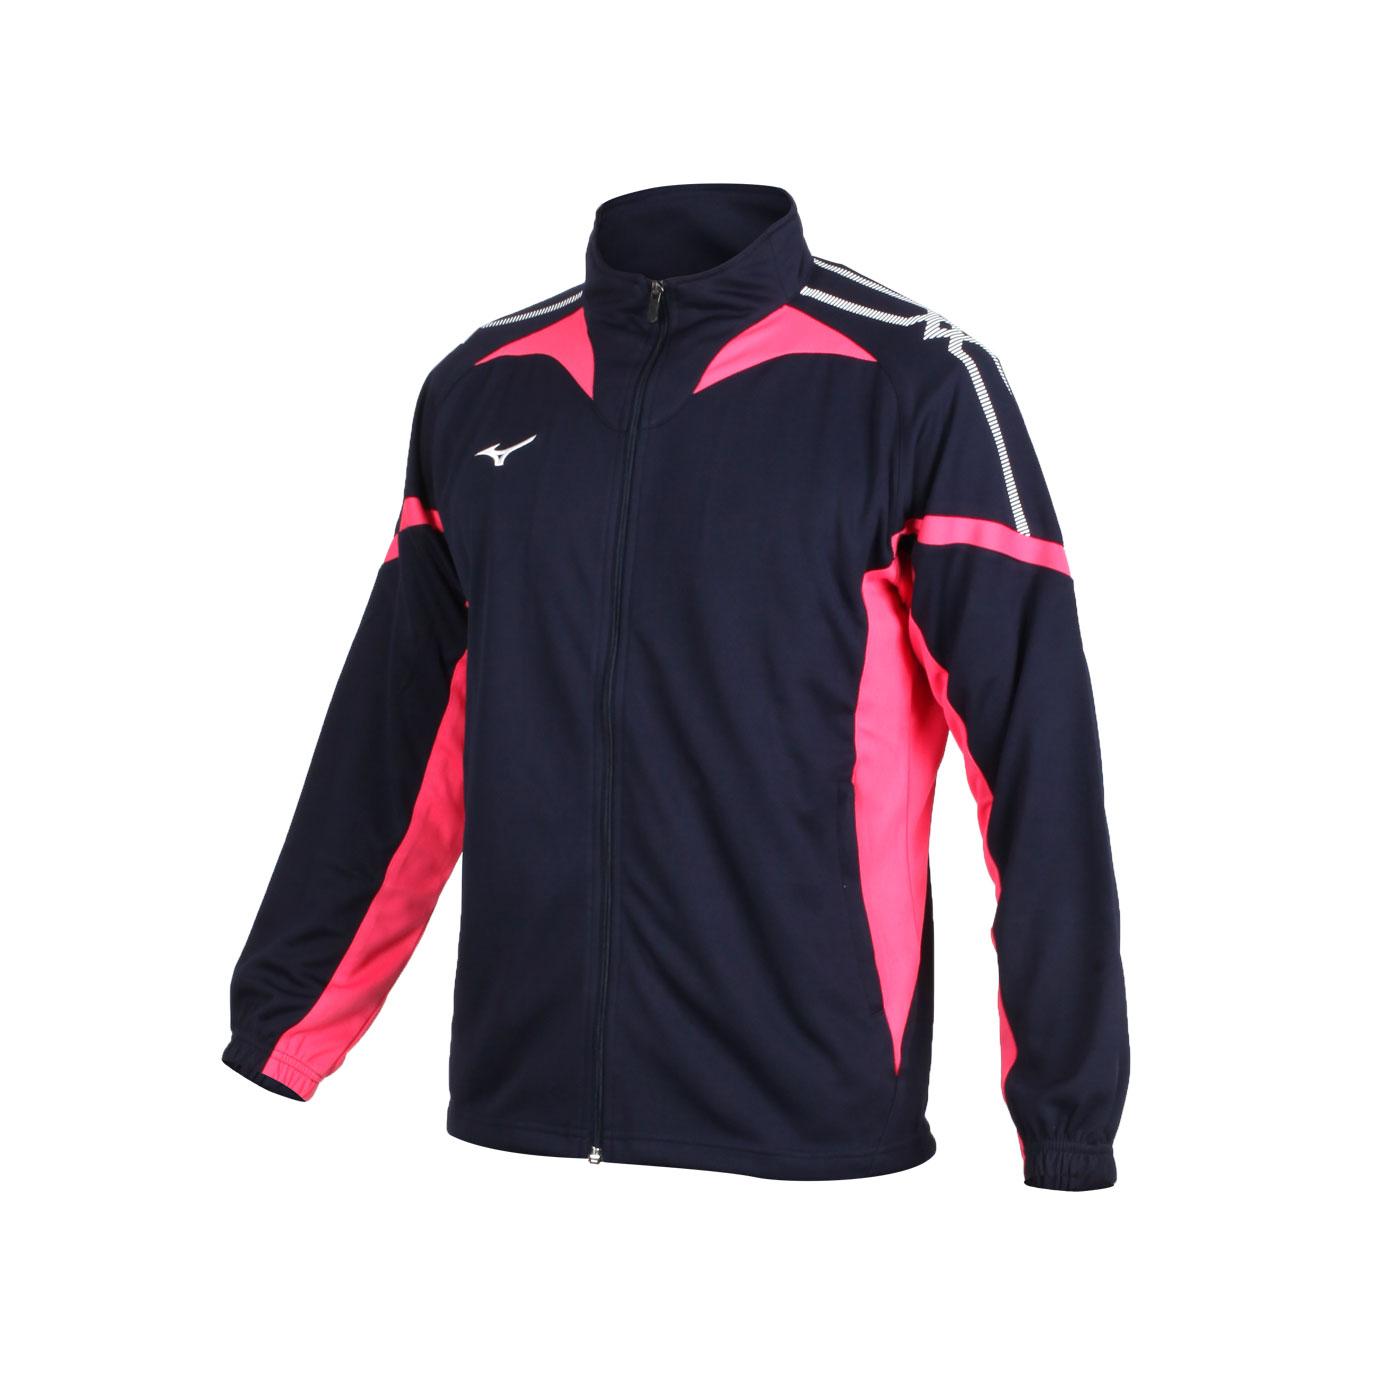 MIZUNO 男款針織運動外套 32TC053514 - 丈青玫紅白